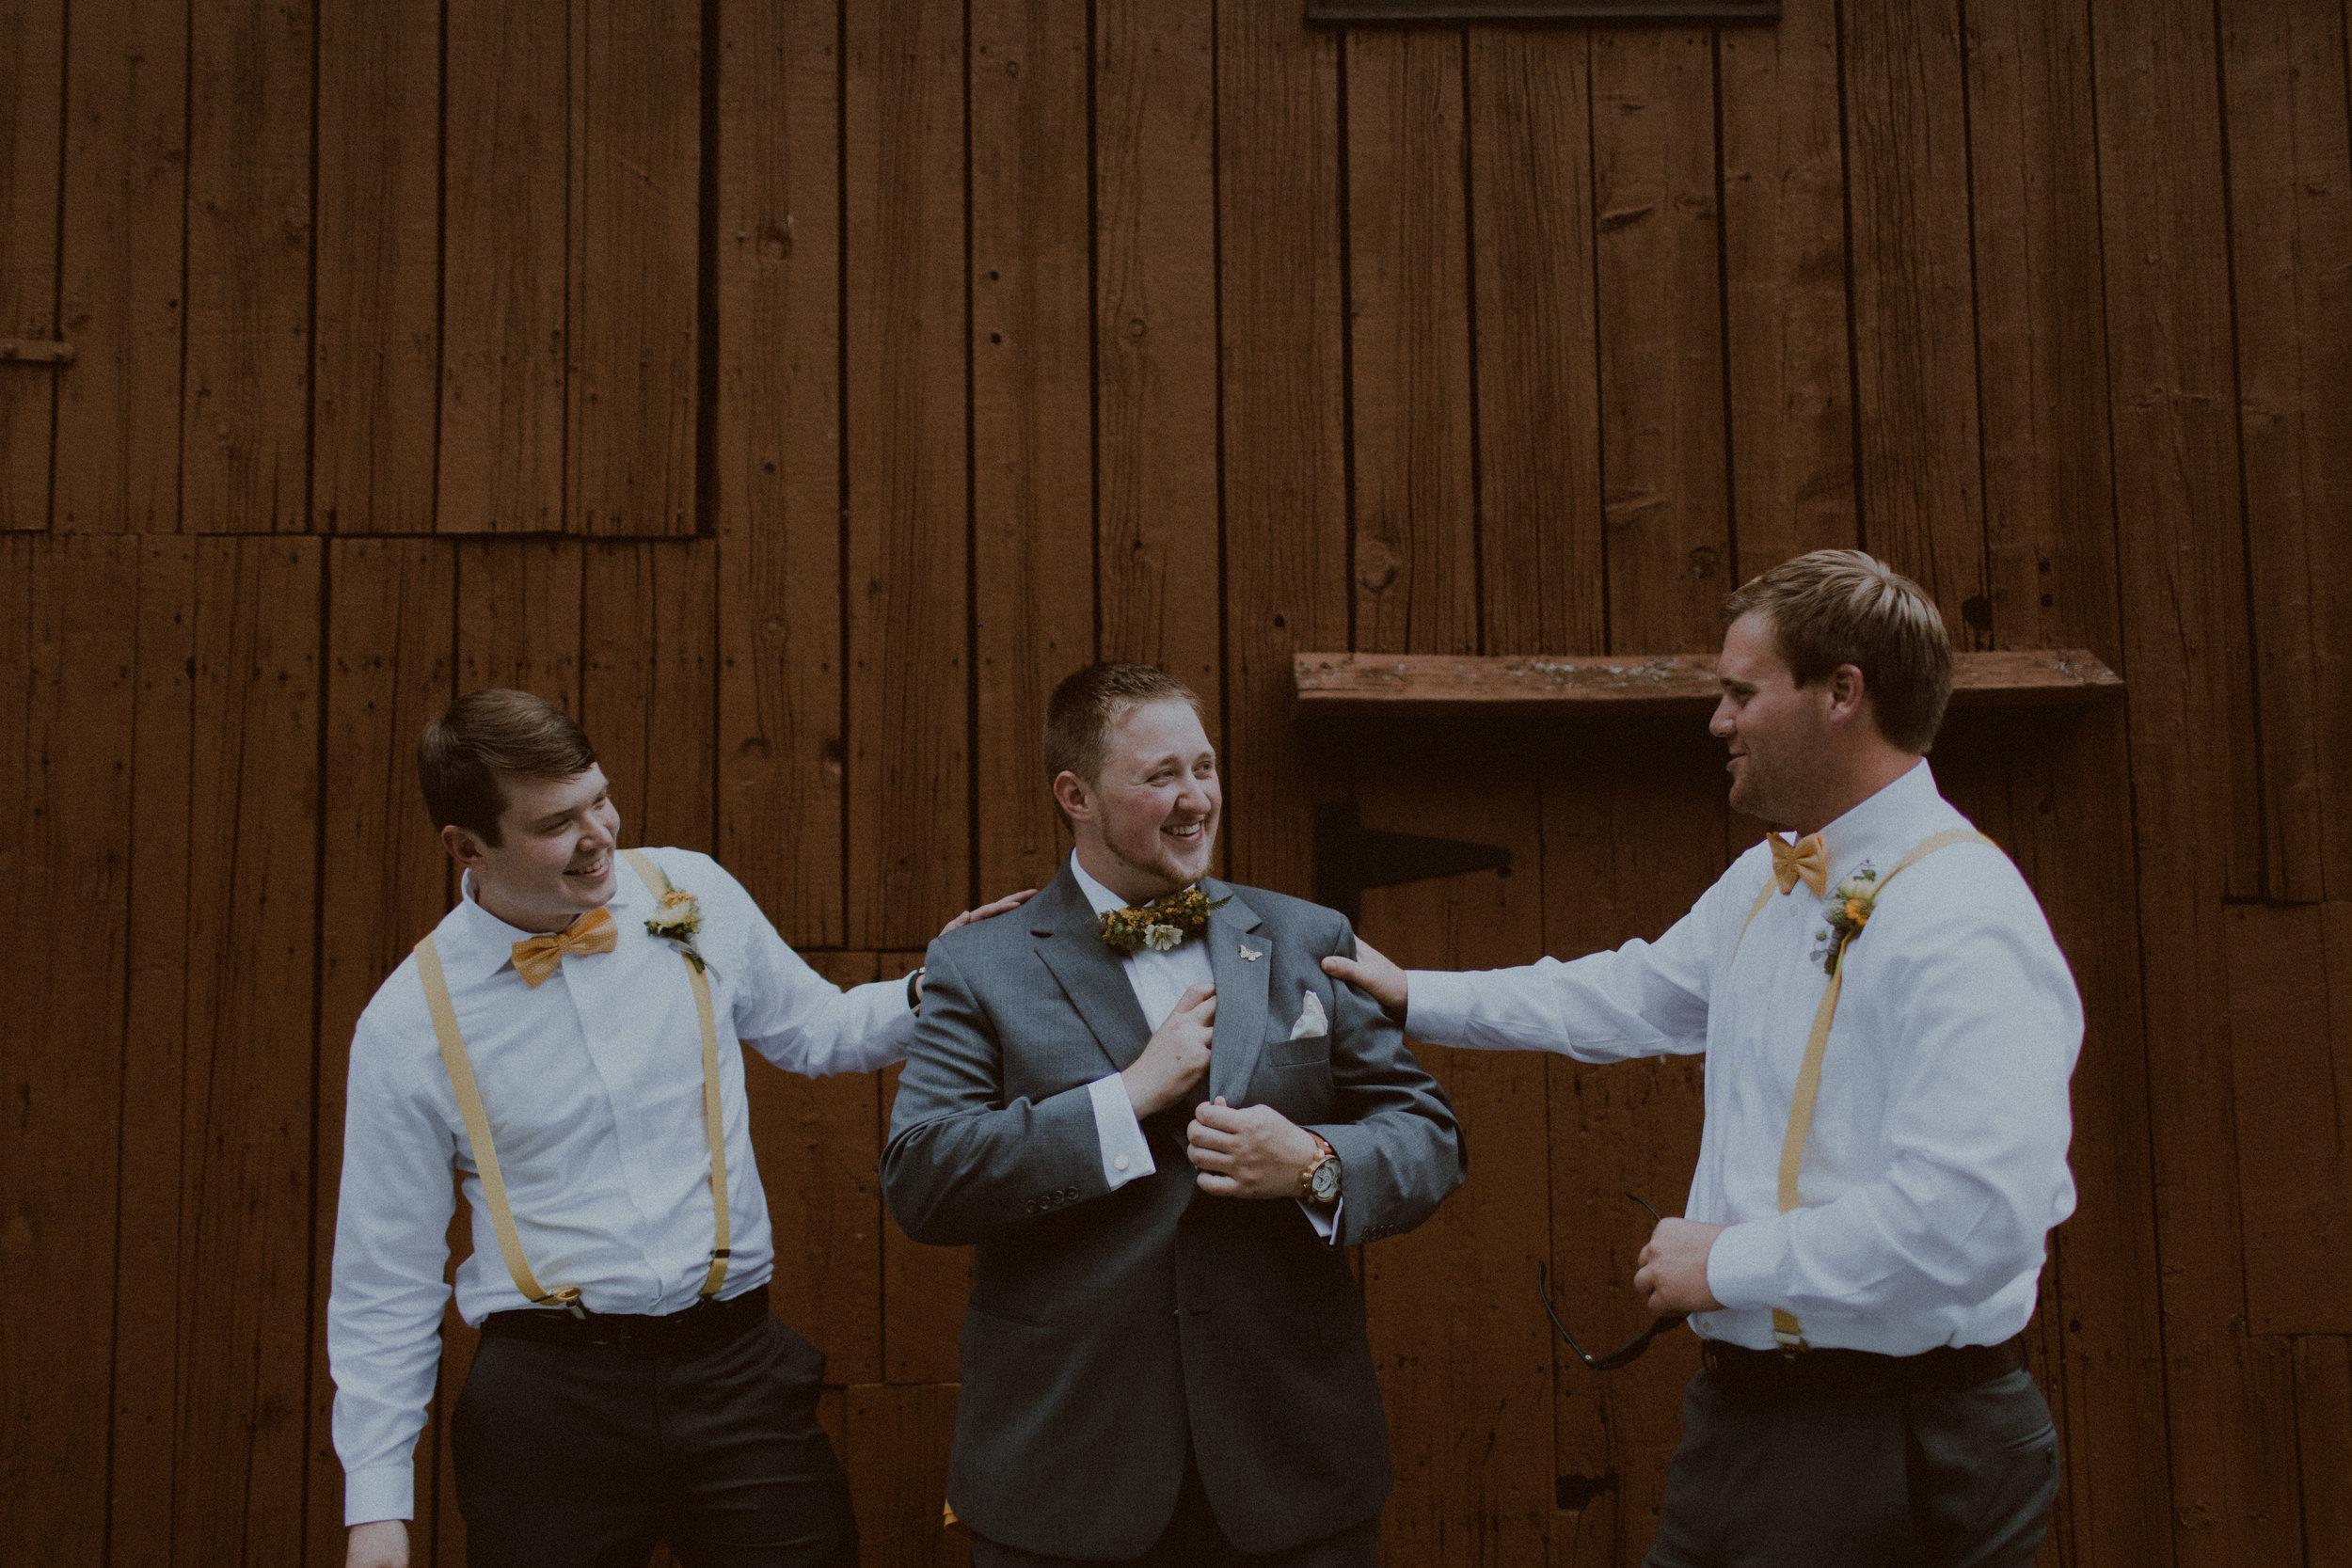 historicshadylanewedding-256.jpg